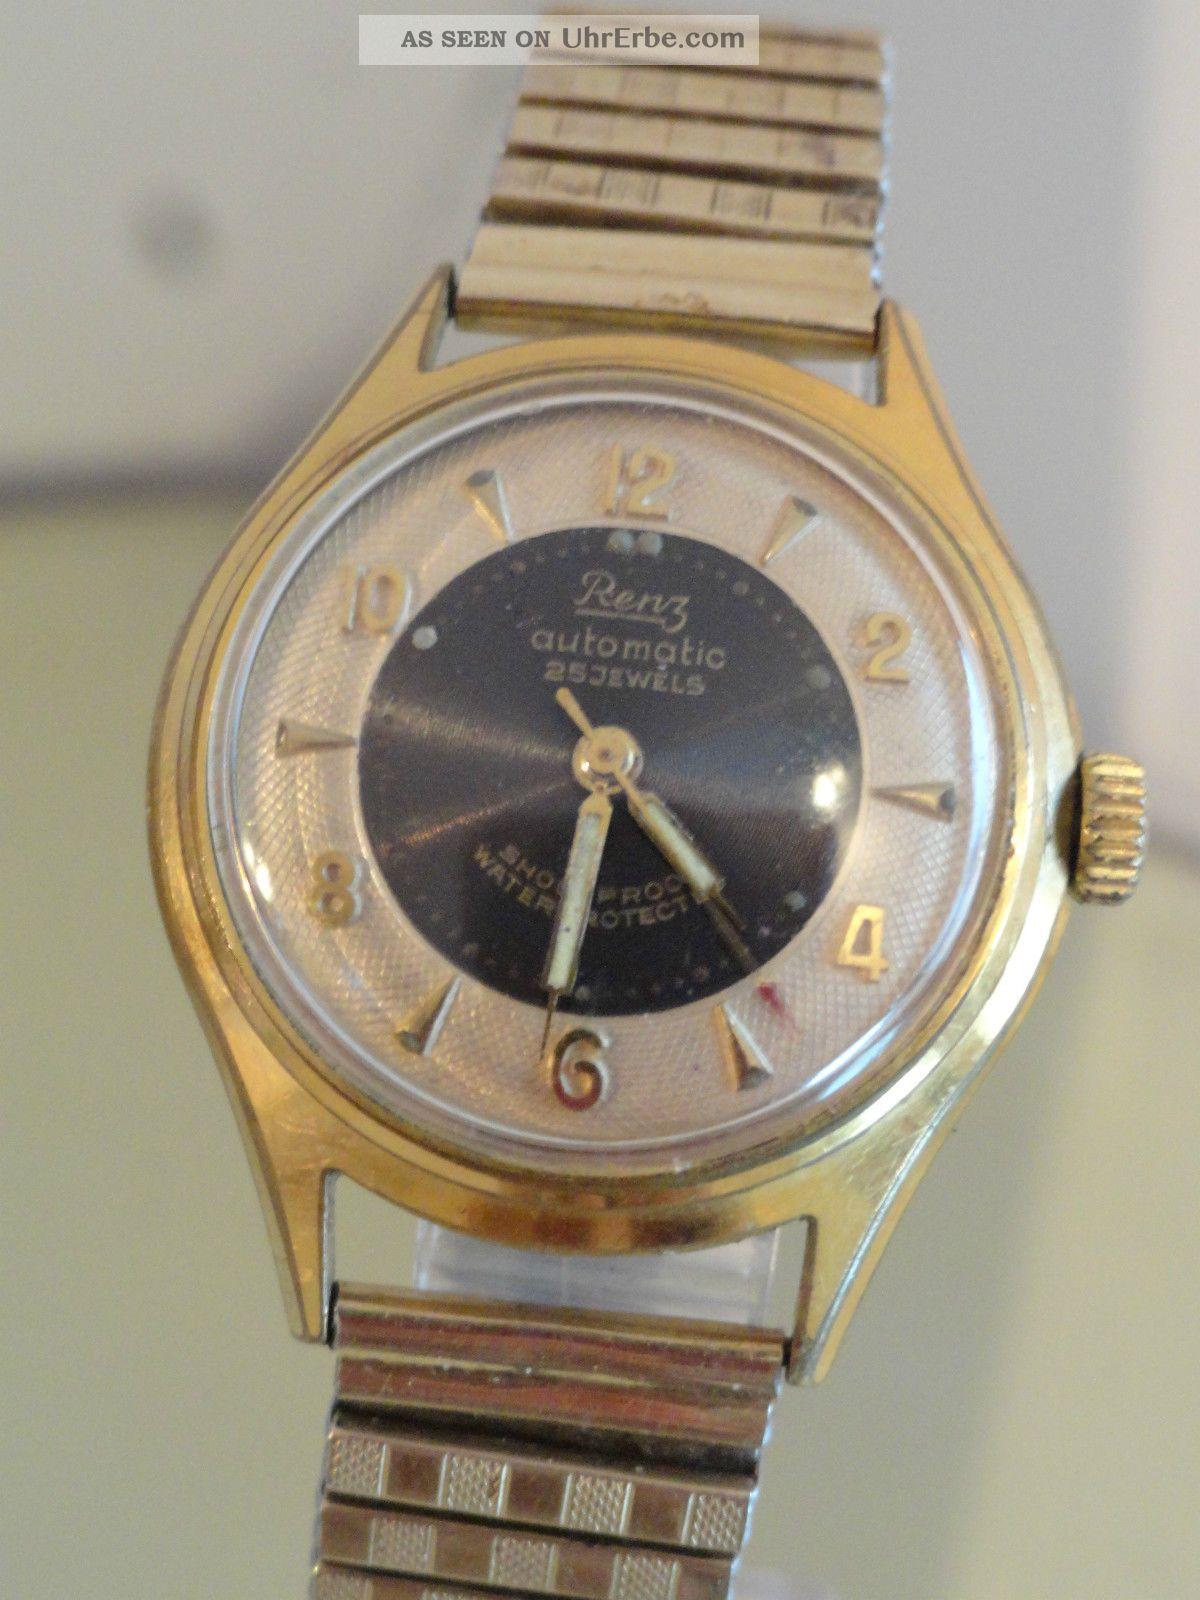 Seltene Renz Armbanduhr,  Automatic Armbanduhren Bild